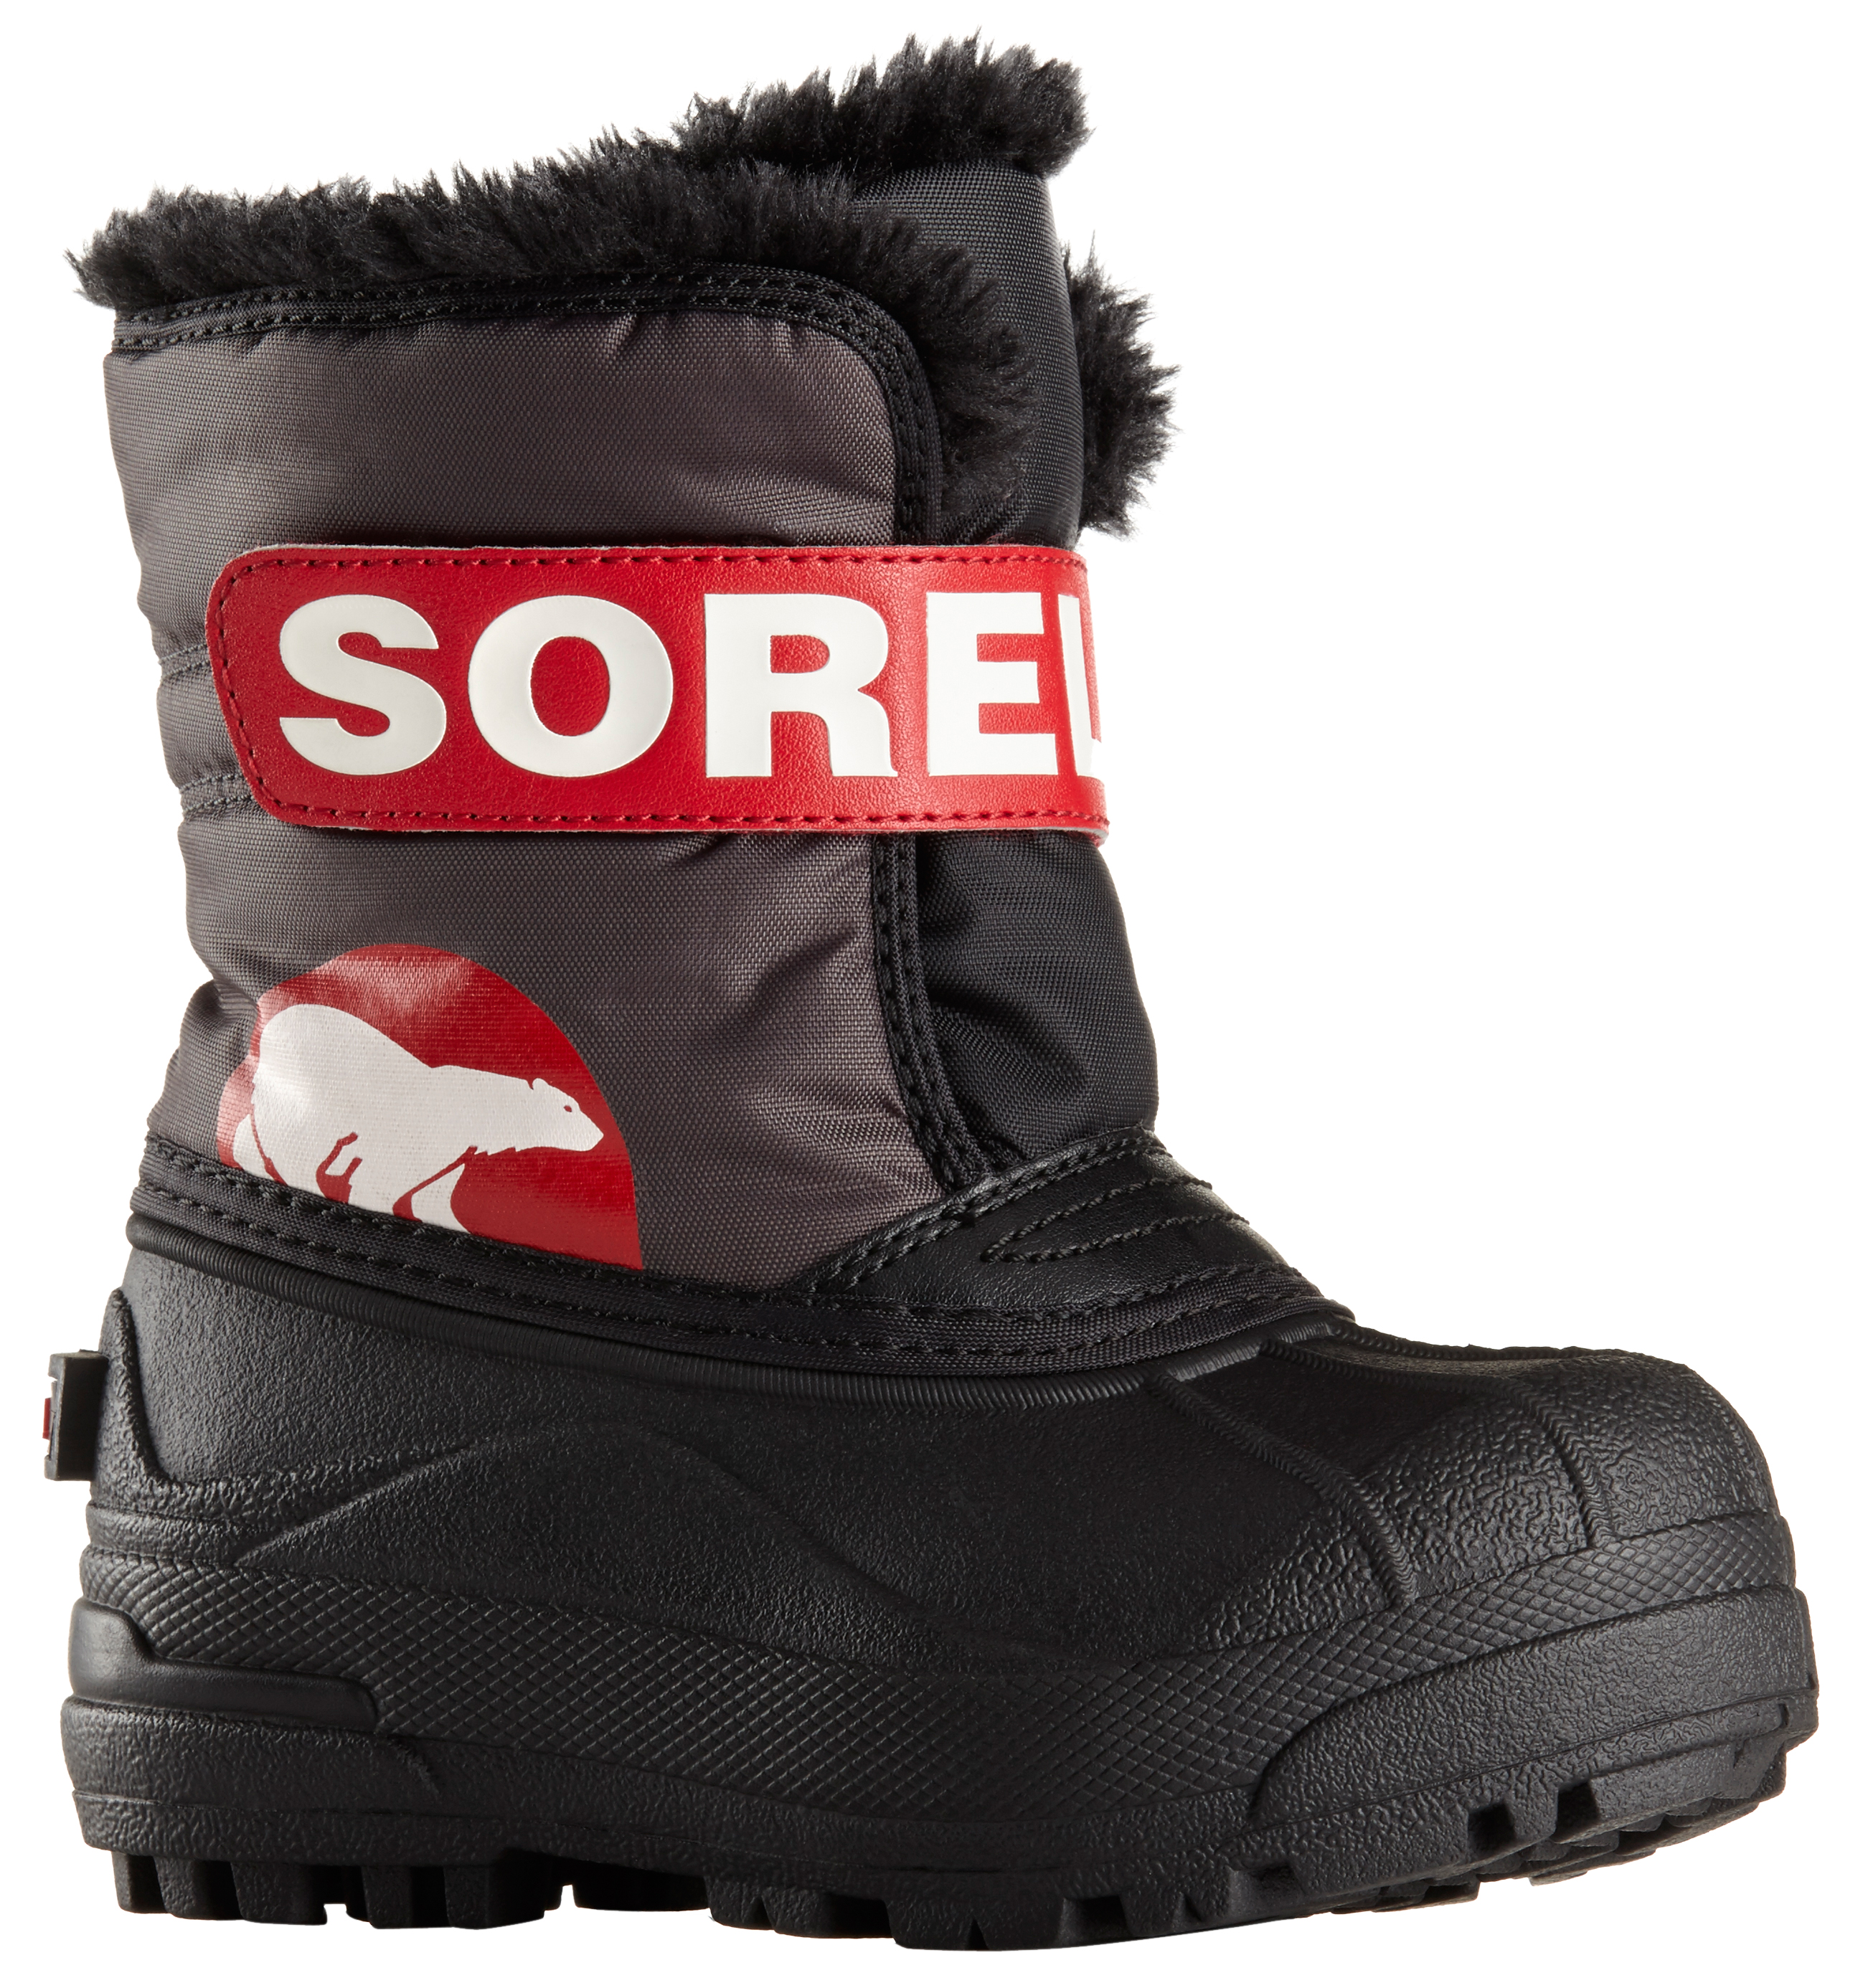 Sorel Snow Commander Winter Boots - Infants 9abf9bebd